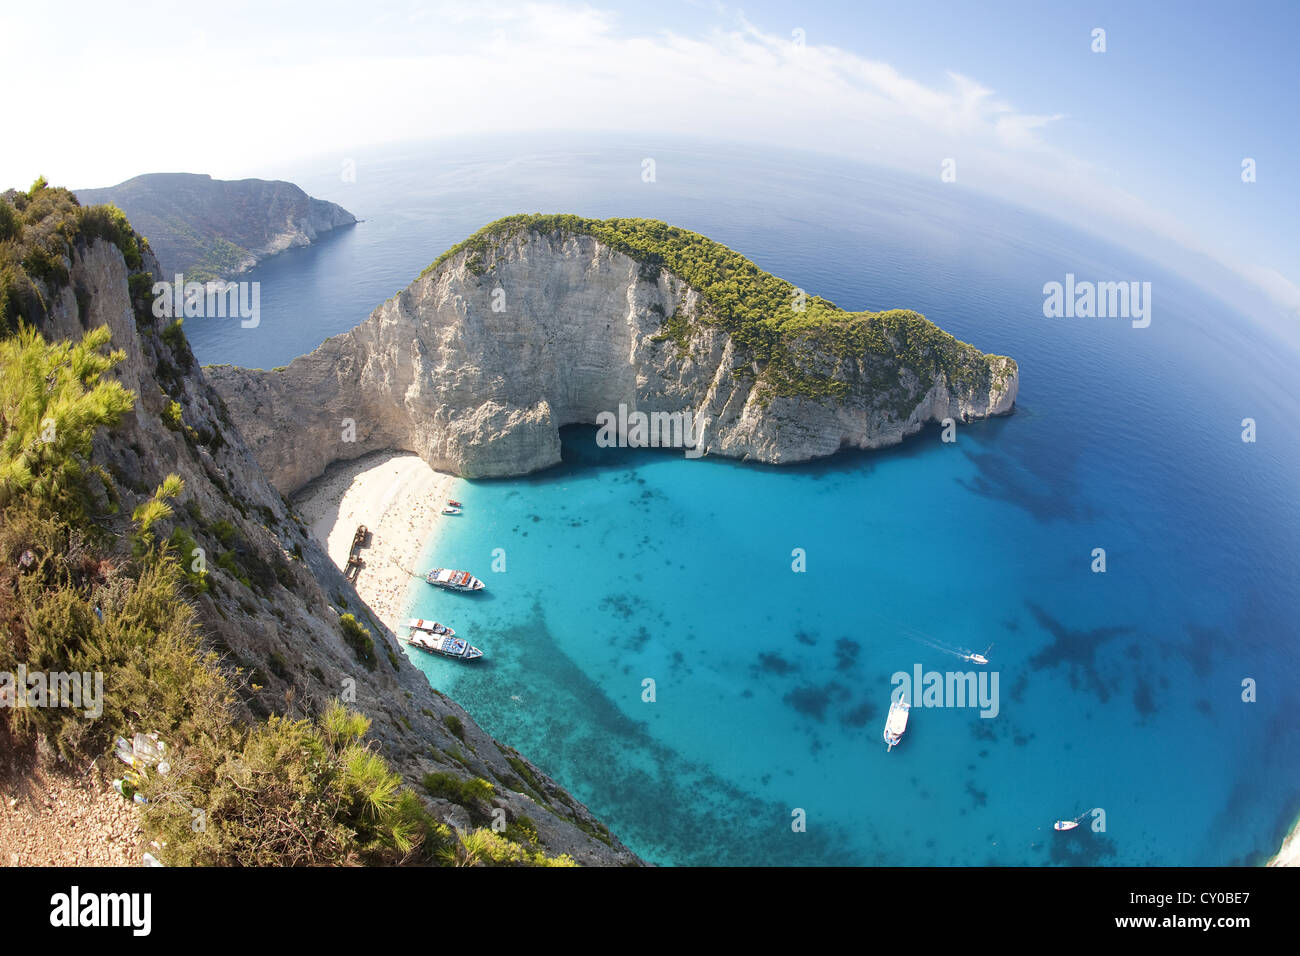 Shipwreck Bay, Zakynthos, Greece, Europe - Stock Image